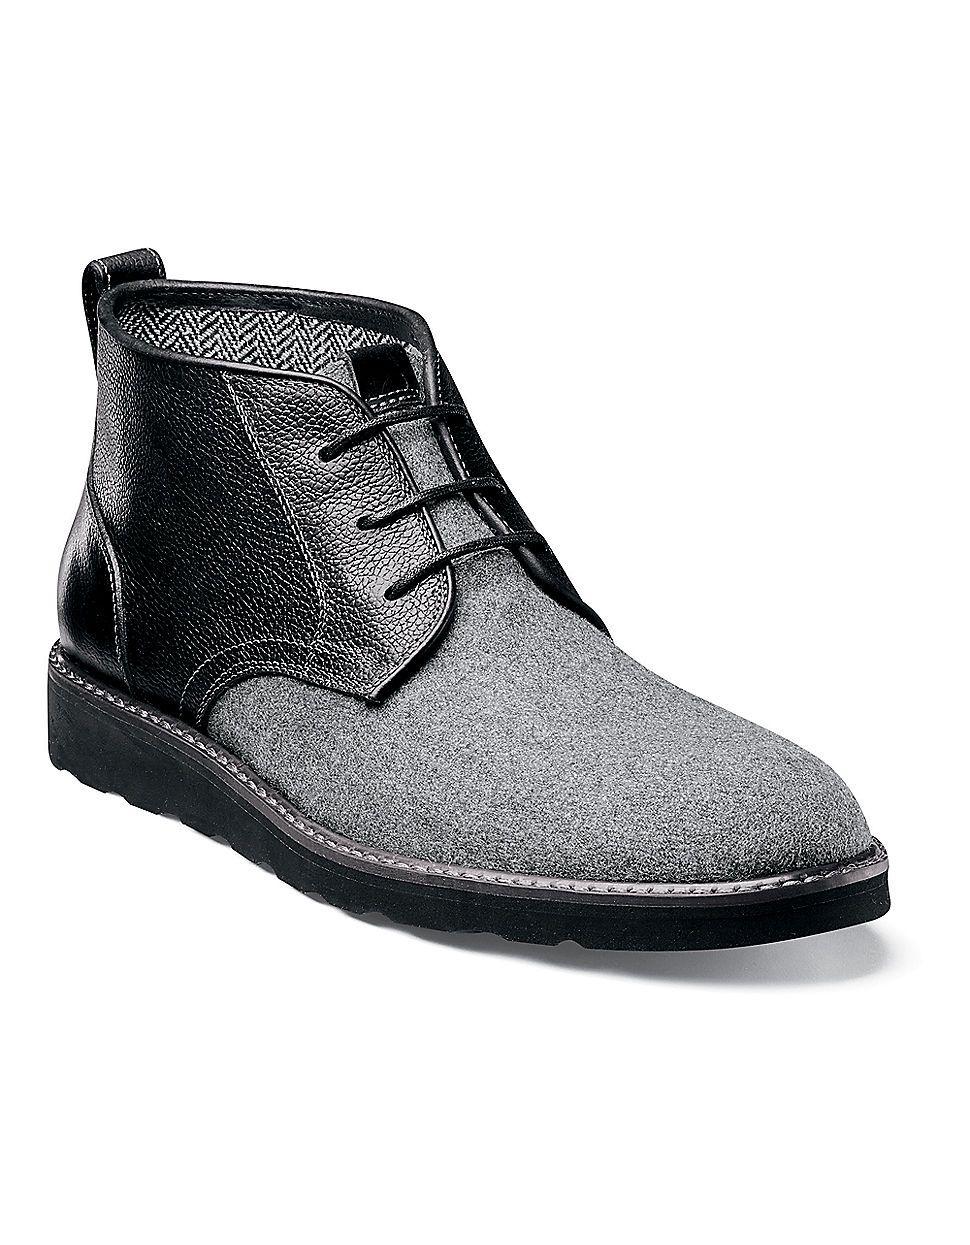 Shoes   Men's Shoes   Highlands Chukka   Hudson's Bay